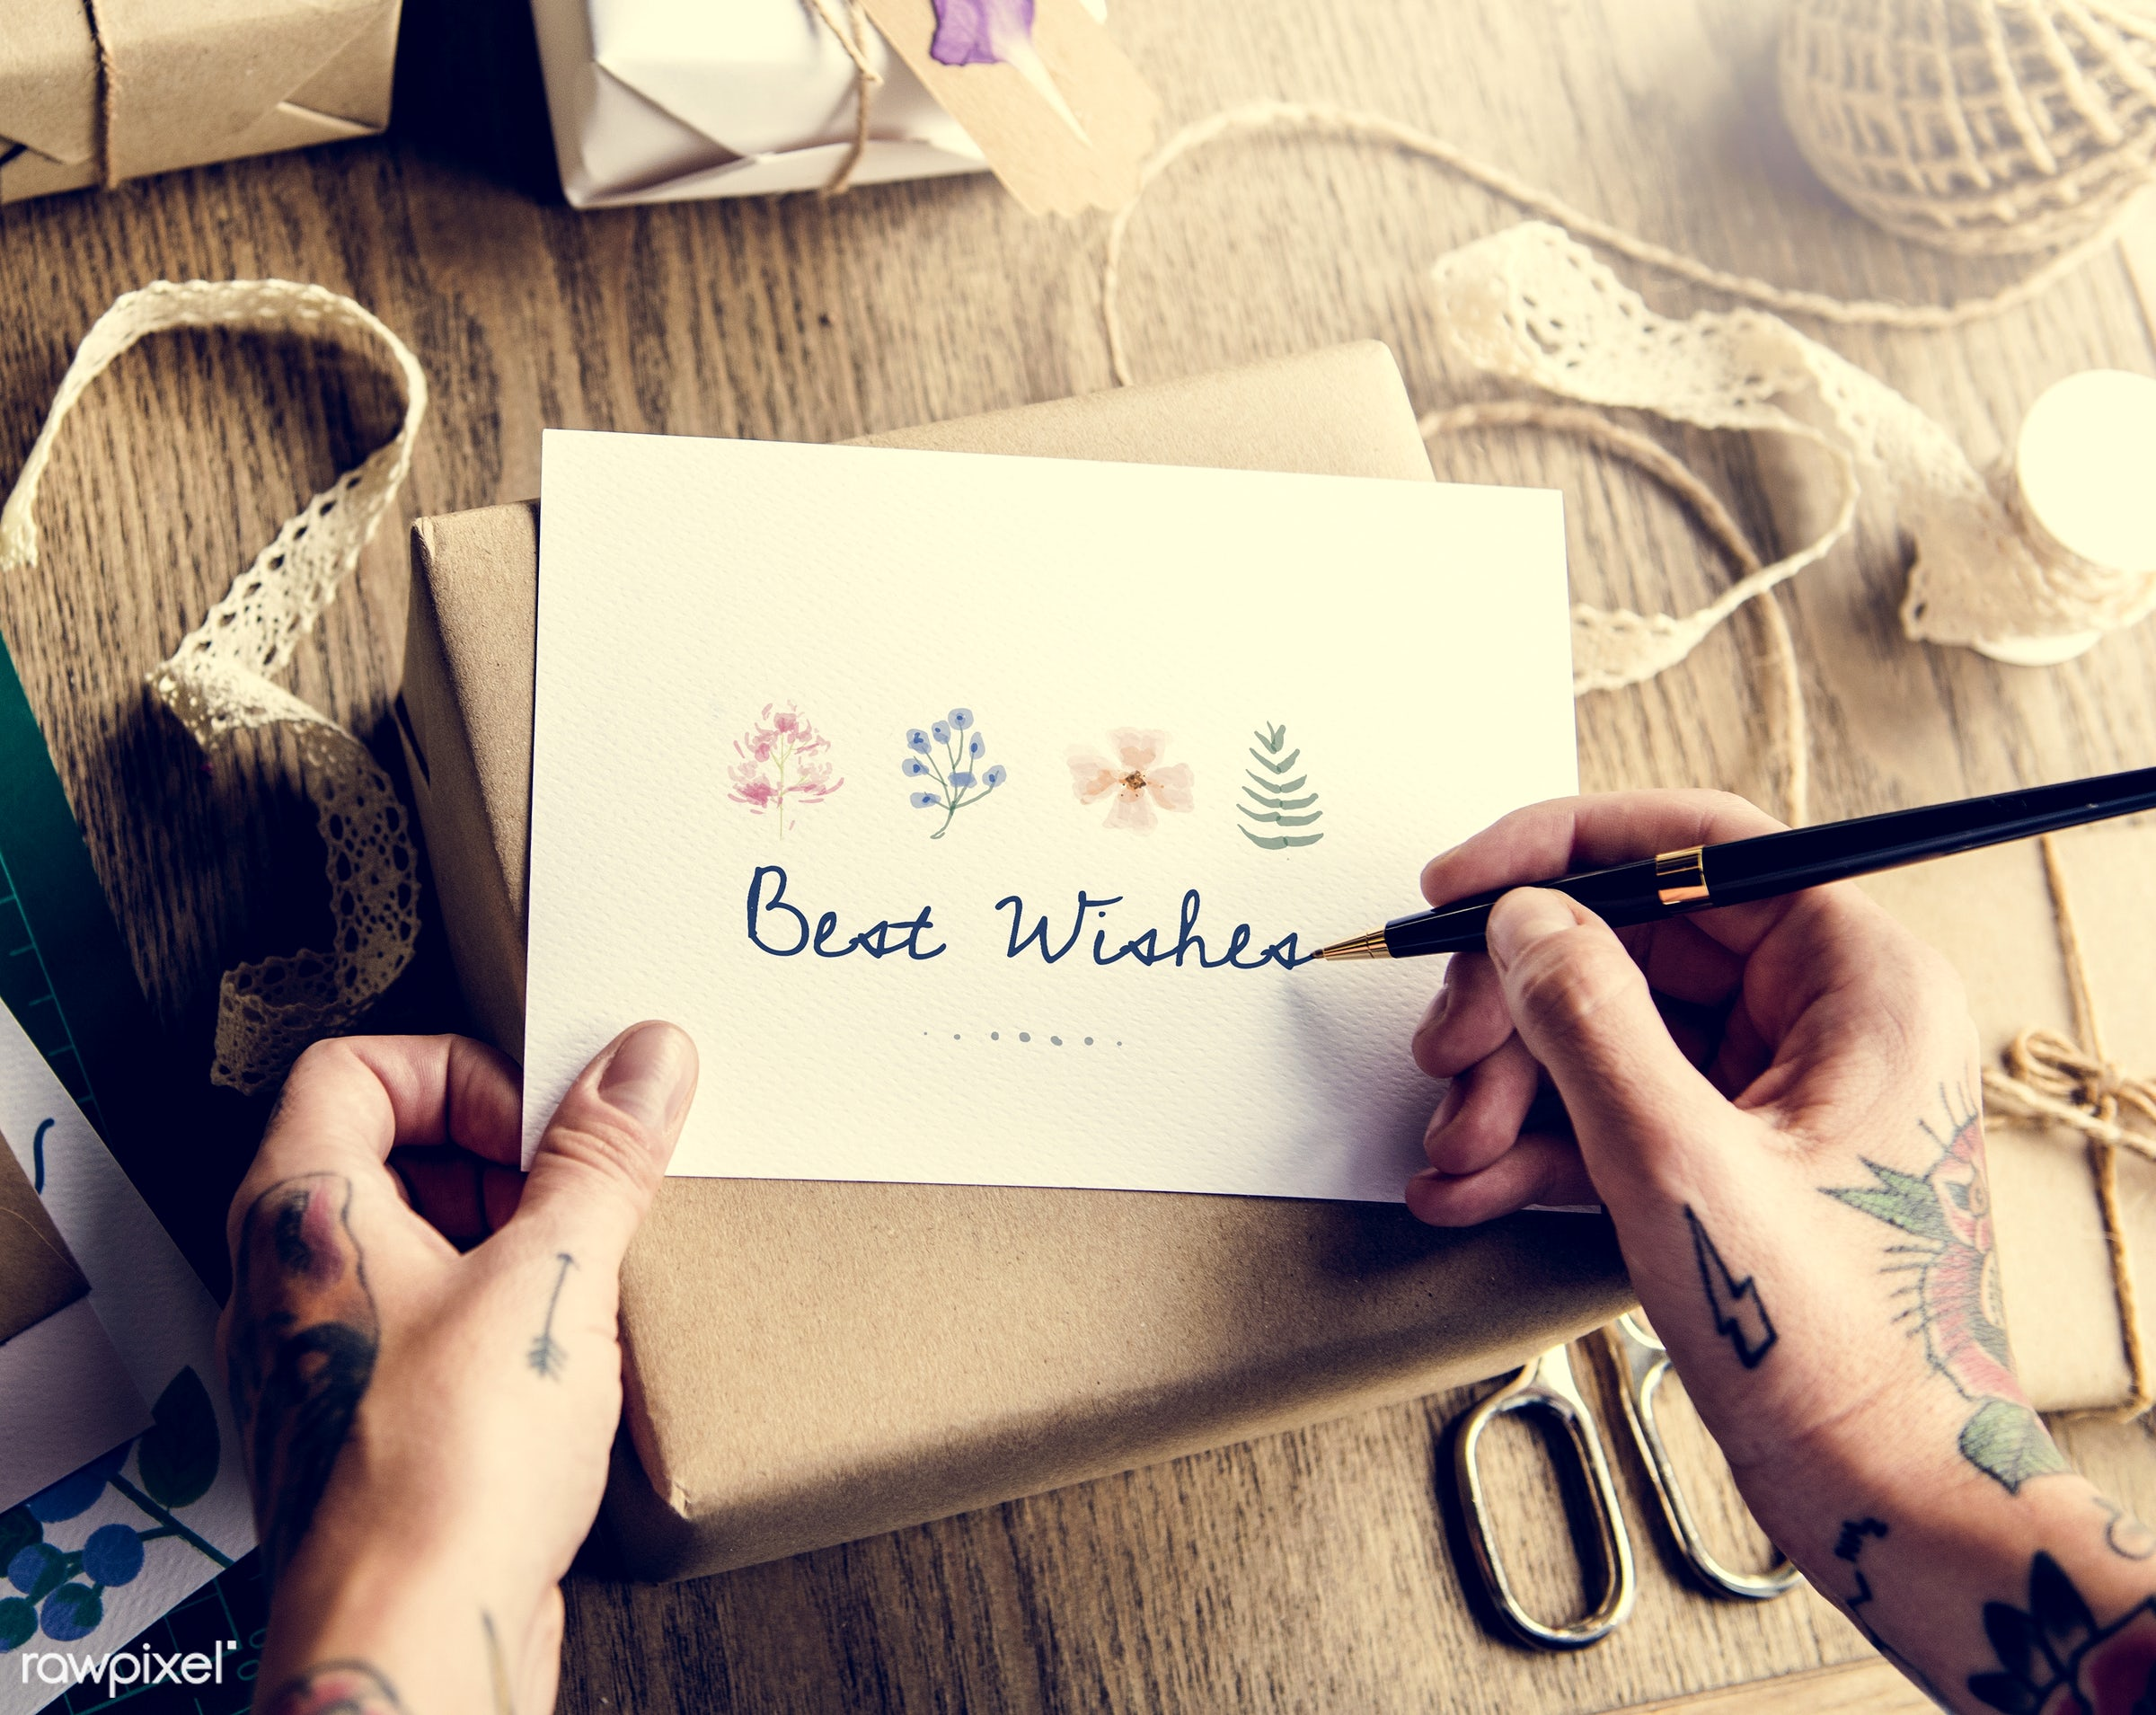 detail, gift, decorative, wish, handicraft, writing, show, hand, dried, hands, attractive, written, write, wooden background...